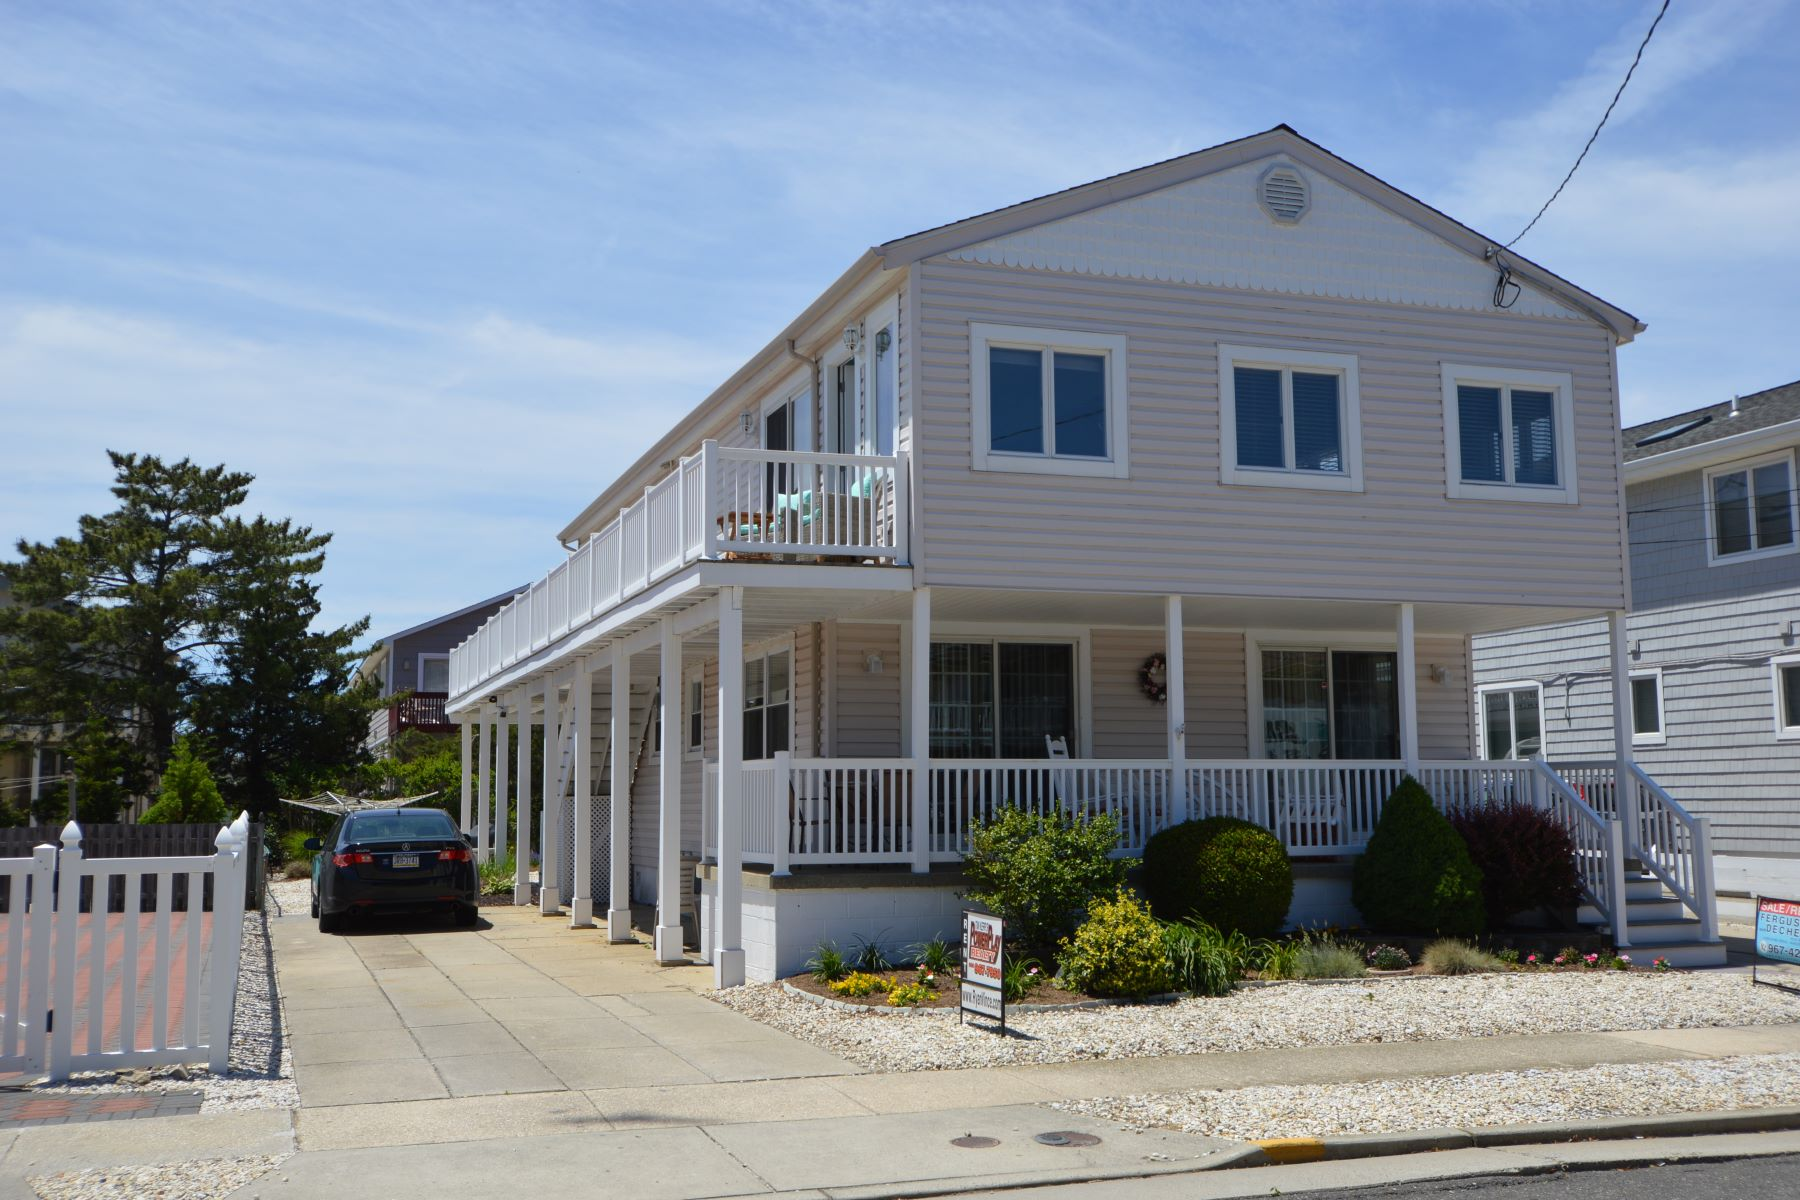 Duplex for Rent at Beach Neighboring Duplex 225 81st Street, Stone Harbor, New Jersey 08247 United States